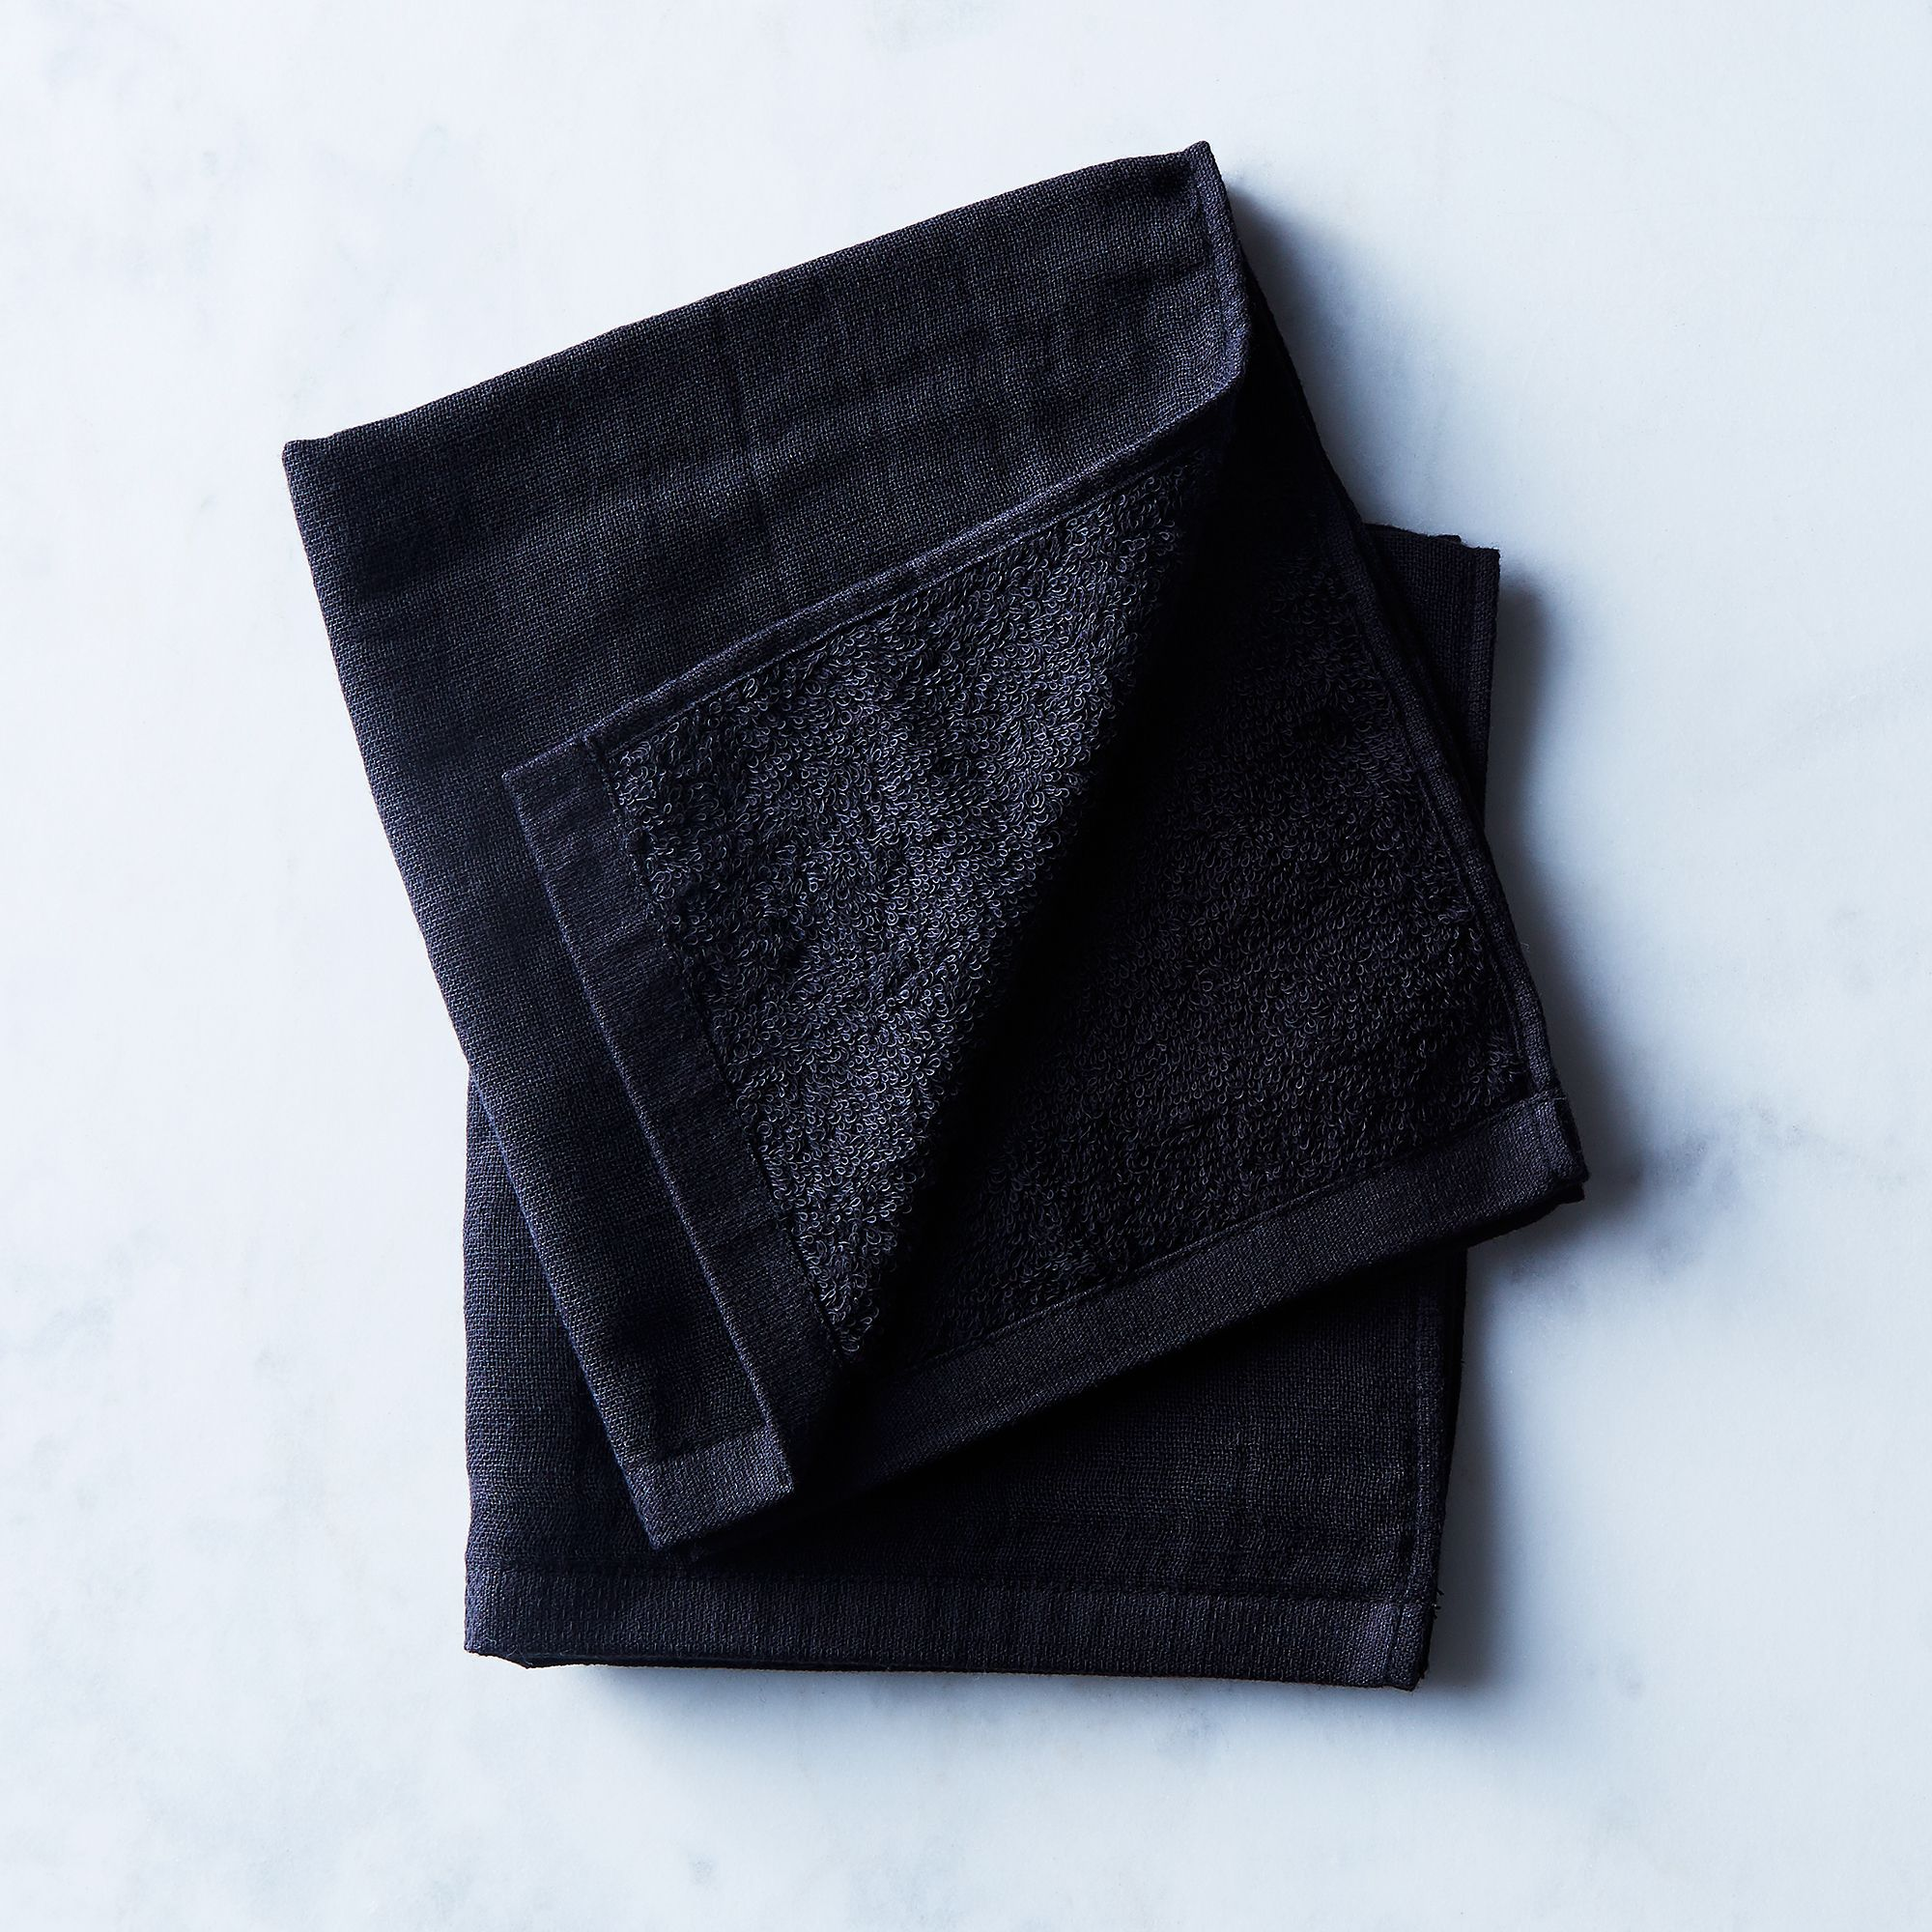 5b125230 17d6 4c17 9428 91f379faa445  2017 0815 morihata gauze towels wash cloths set of 2 black silo julia gartland 36068